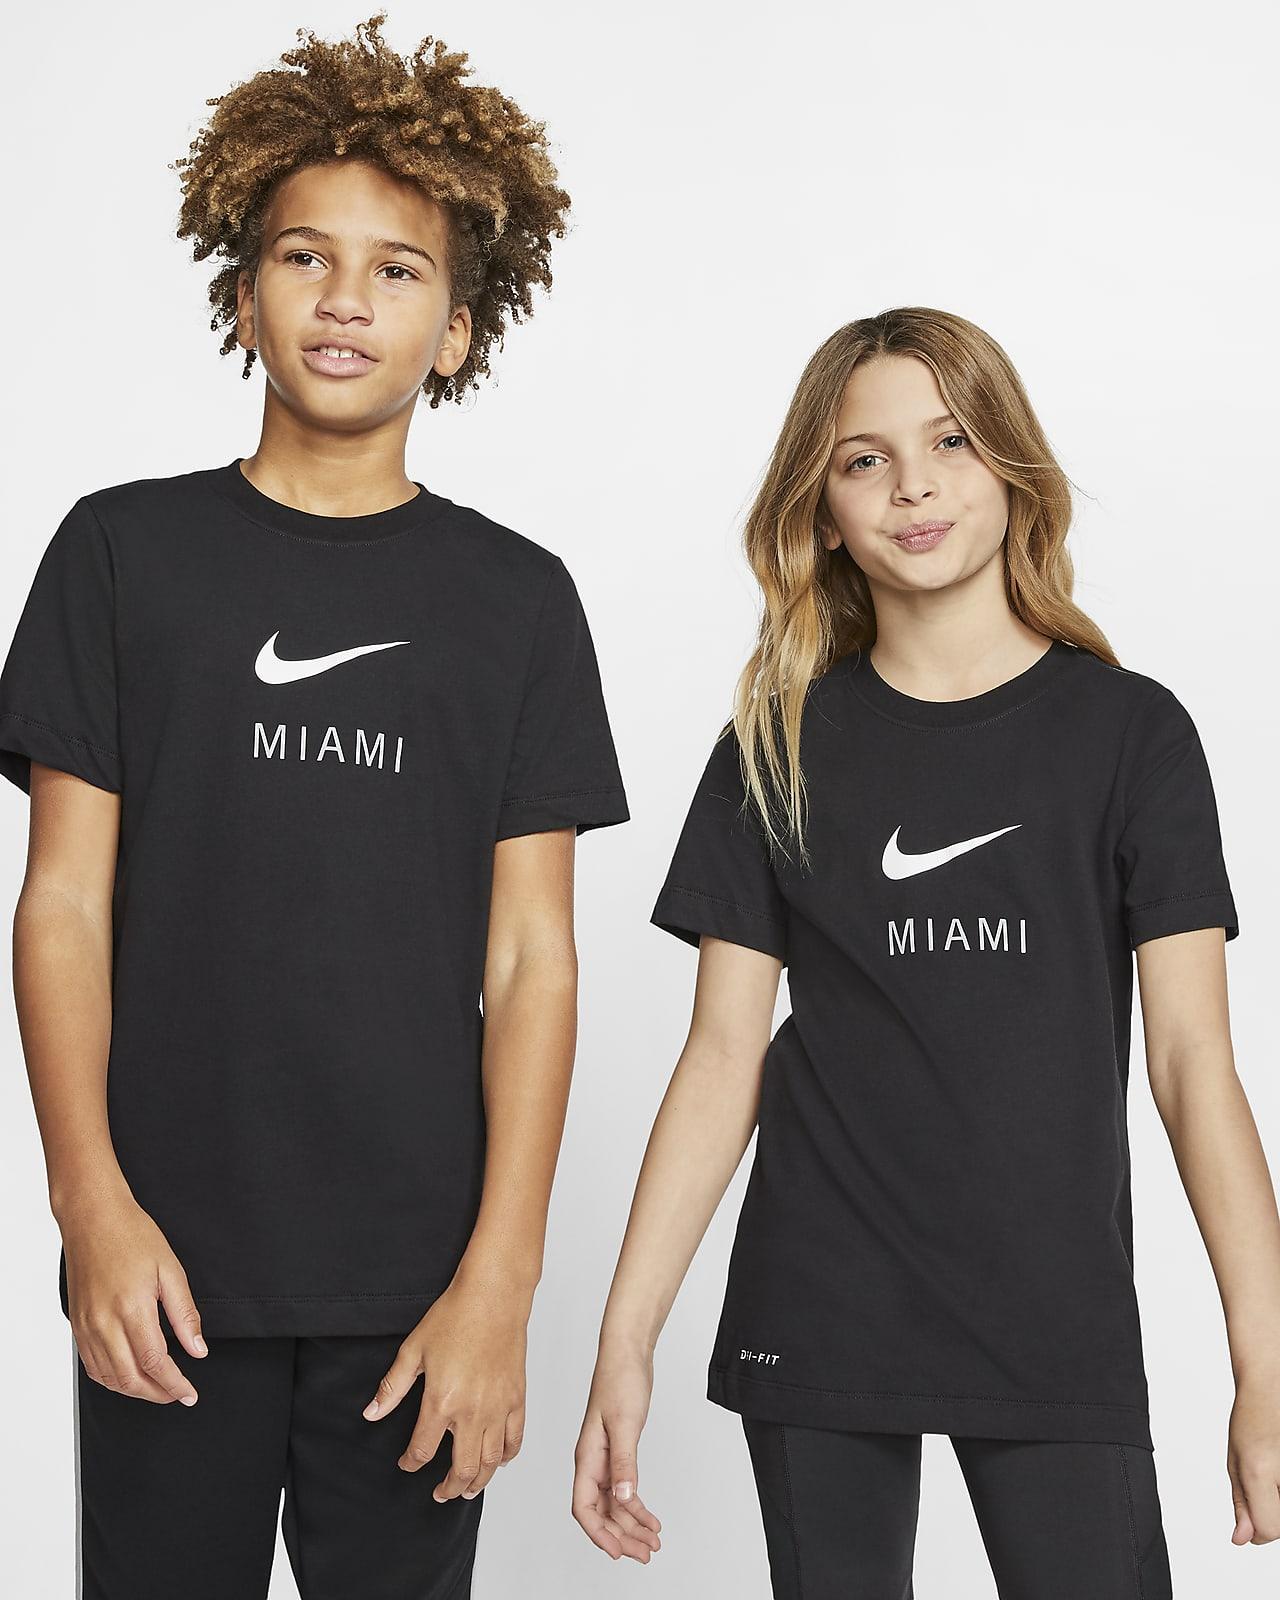 Playera para niños talla grande Nike Dri-FIT Miami